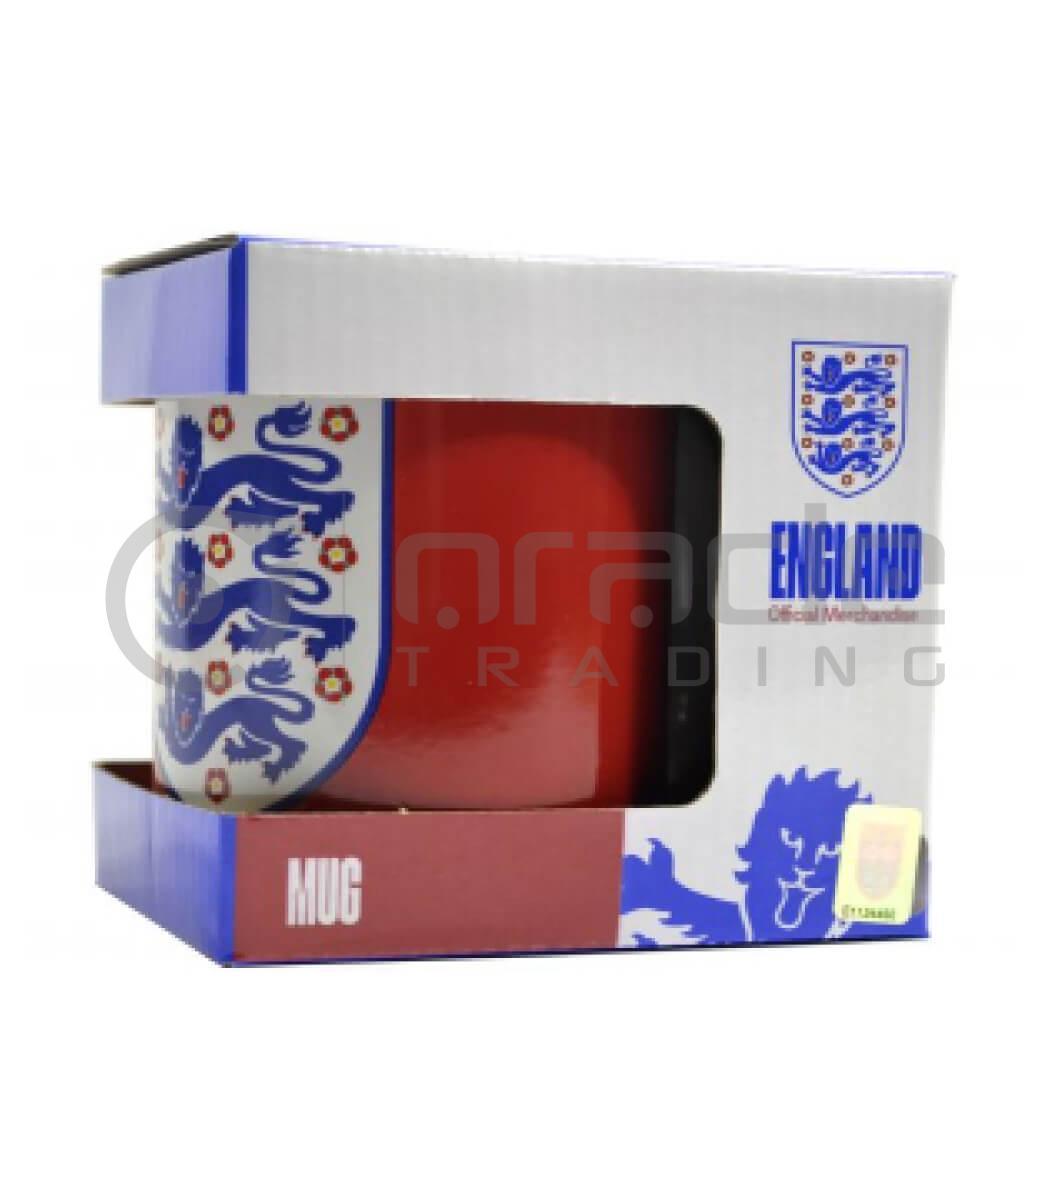 England FA Mug - Crest